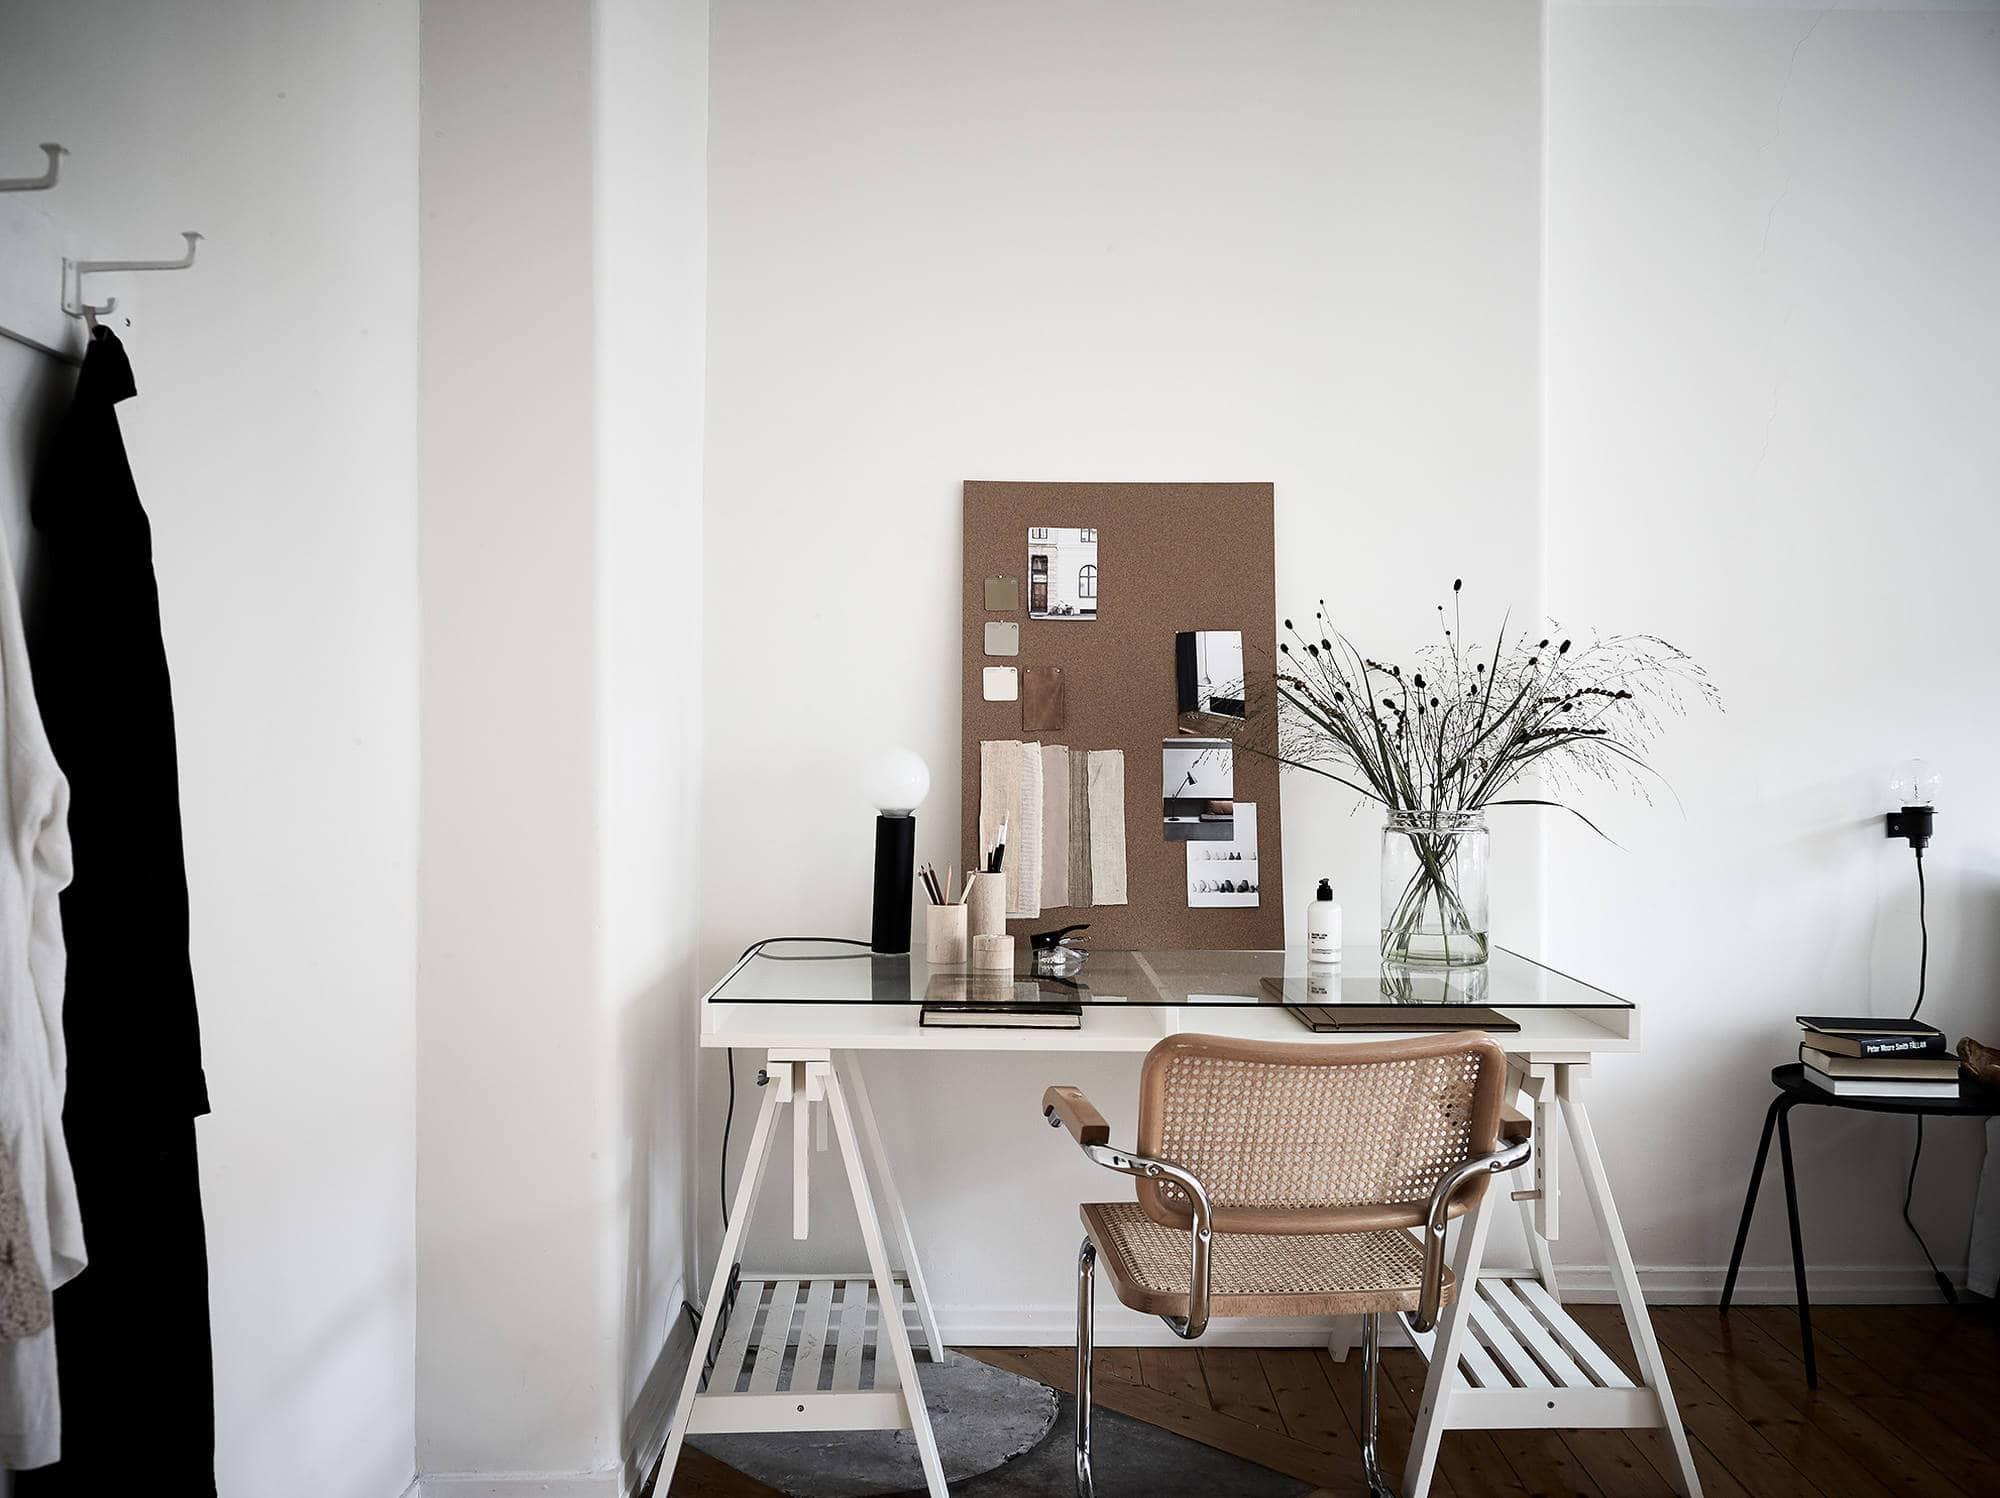 Amazing Home Design Blog Decor Blogs 2015 Top 12 Interior In India Baggout